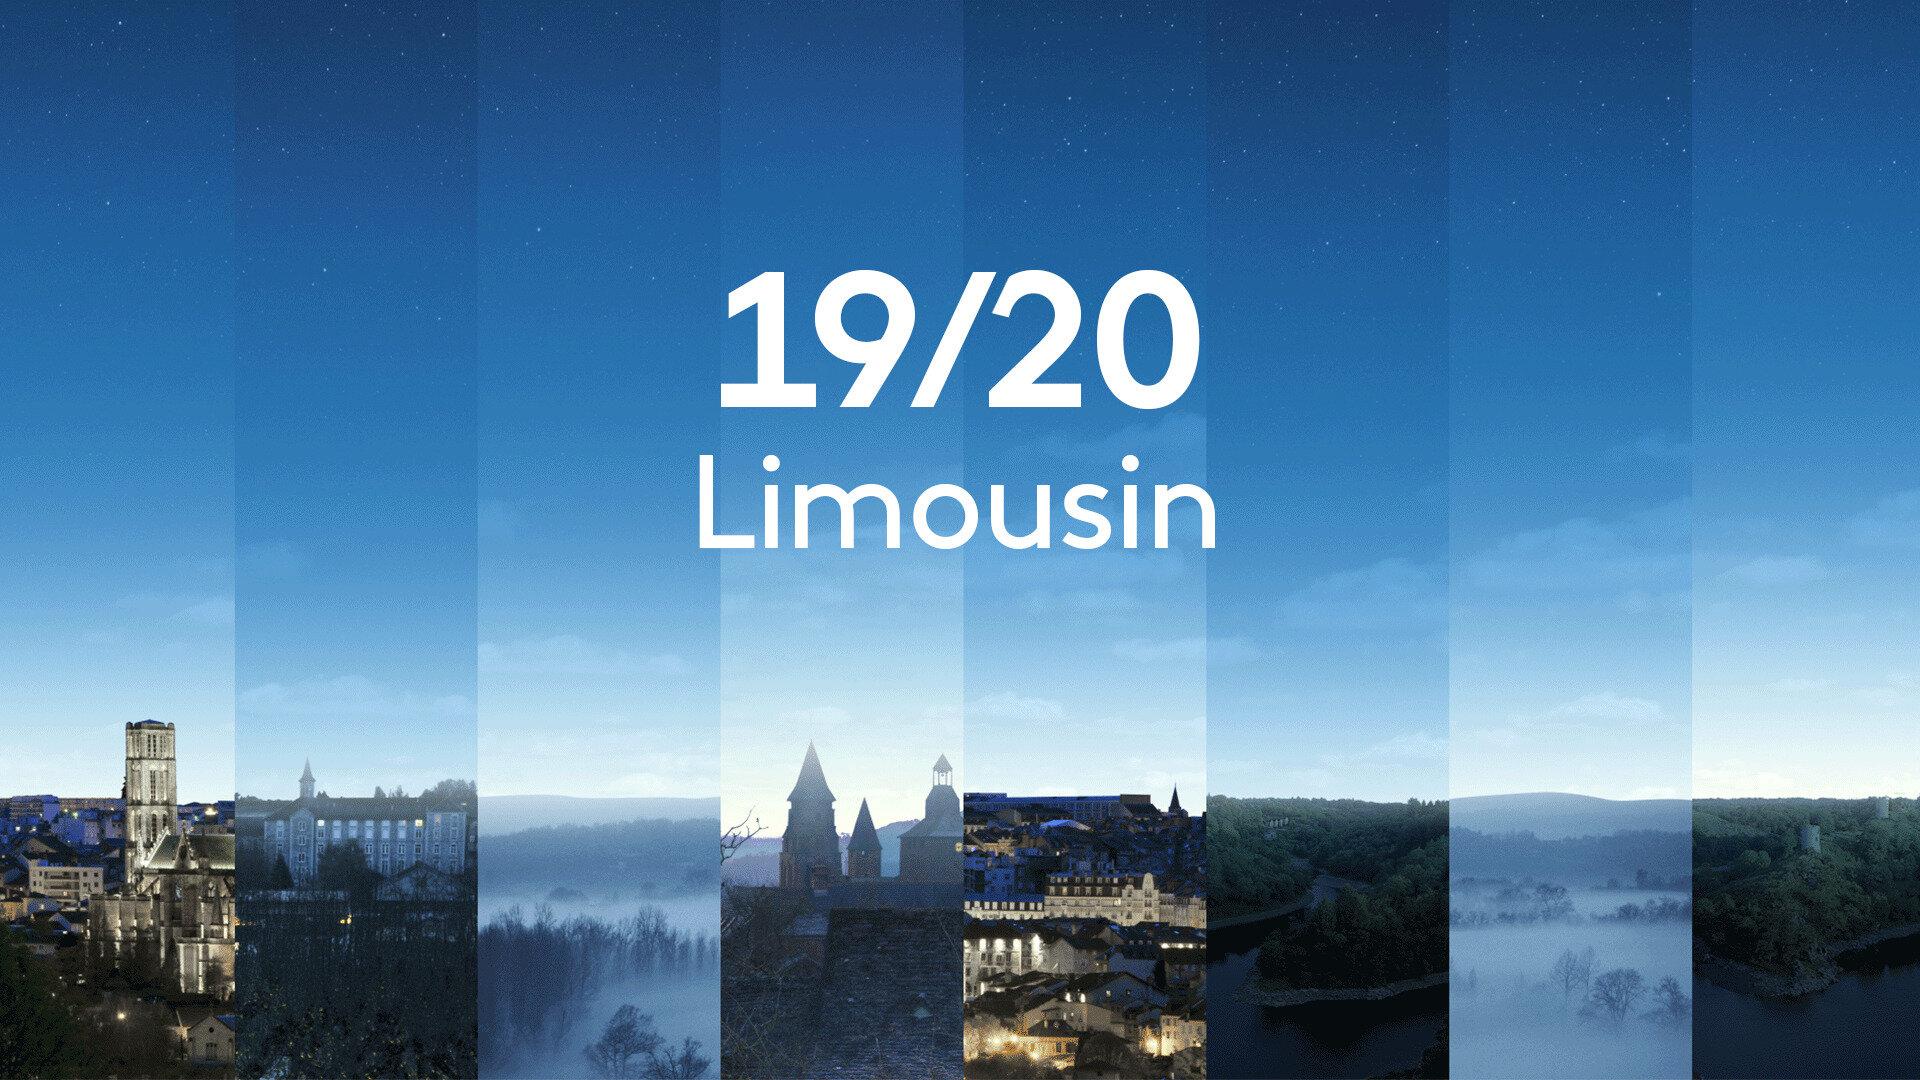 19/20 Limousin